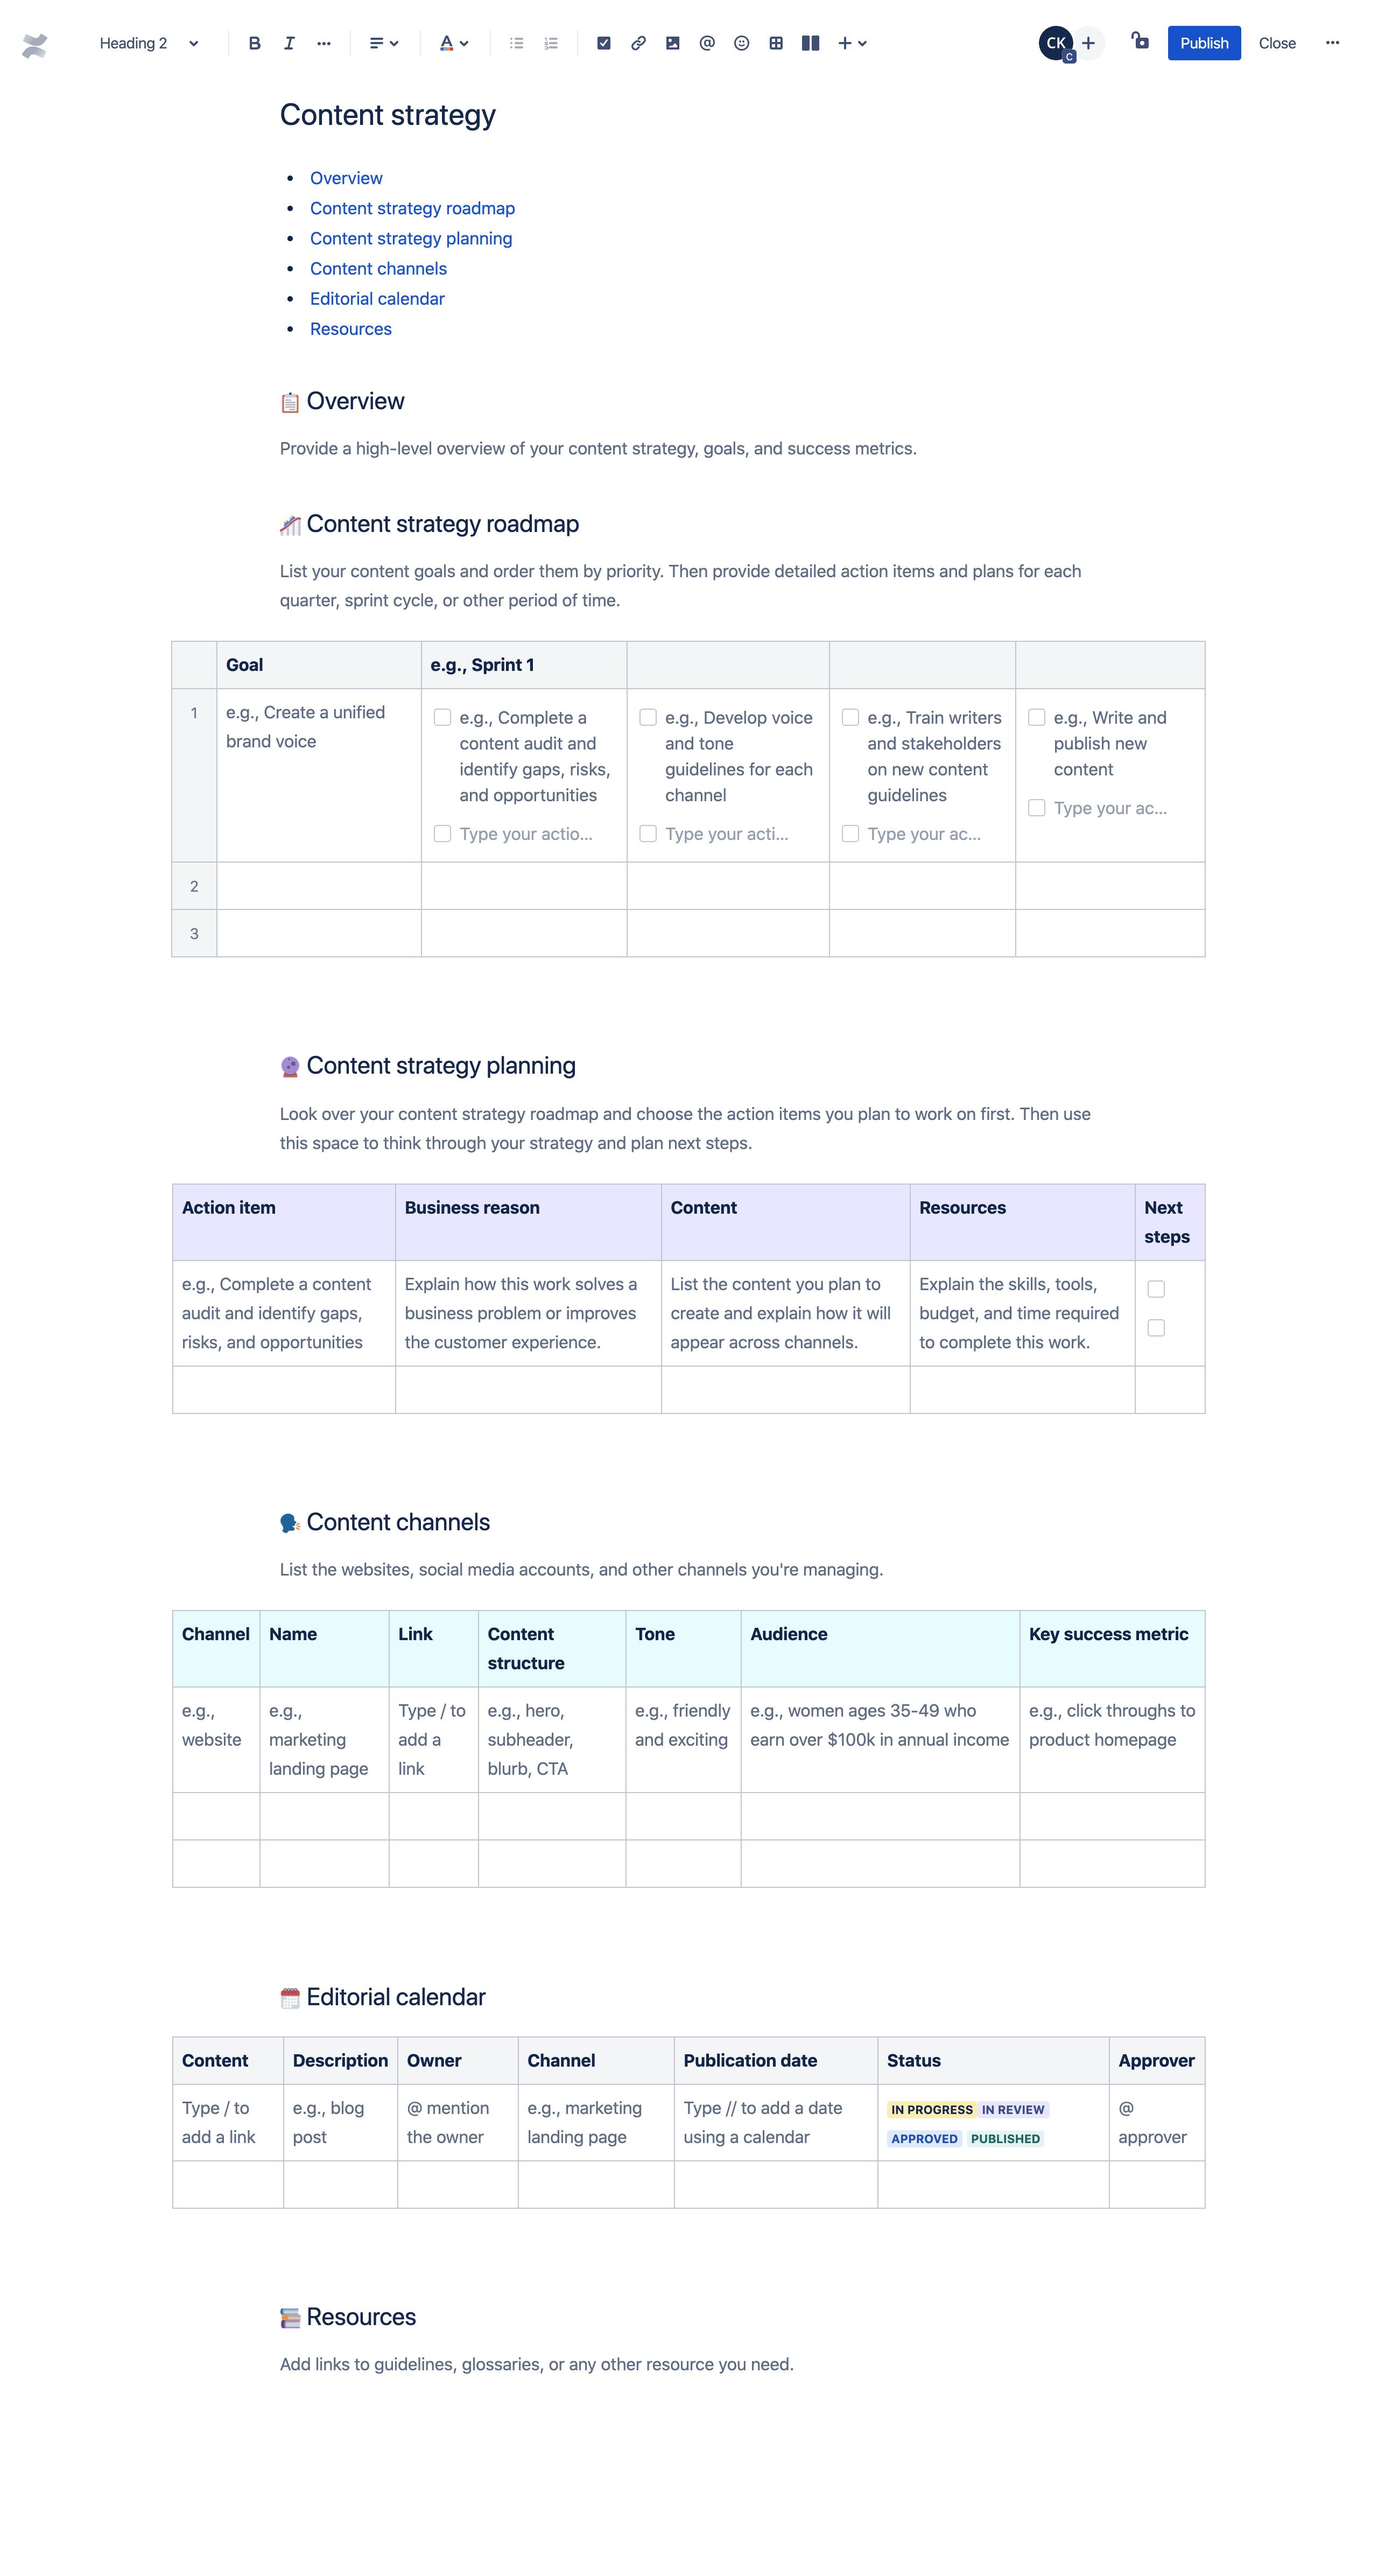 Шаблон контент-стратегии